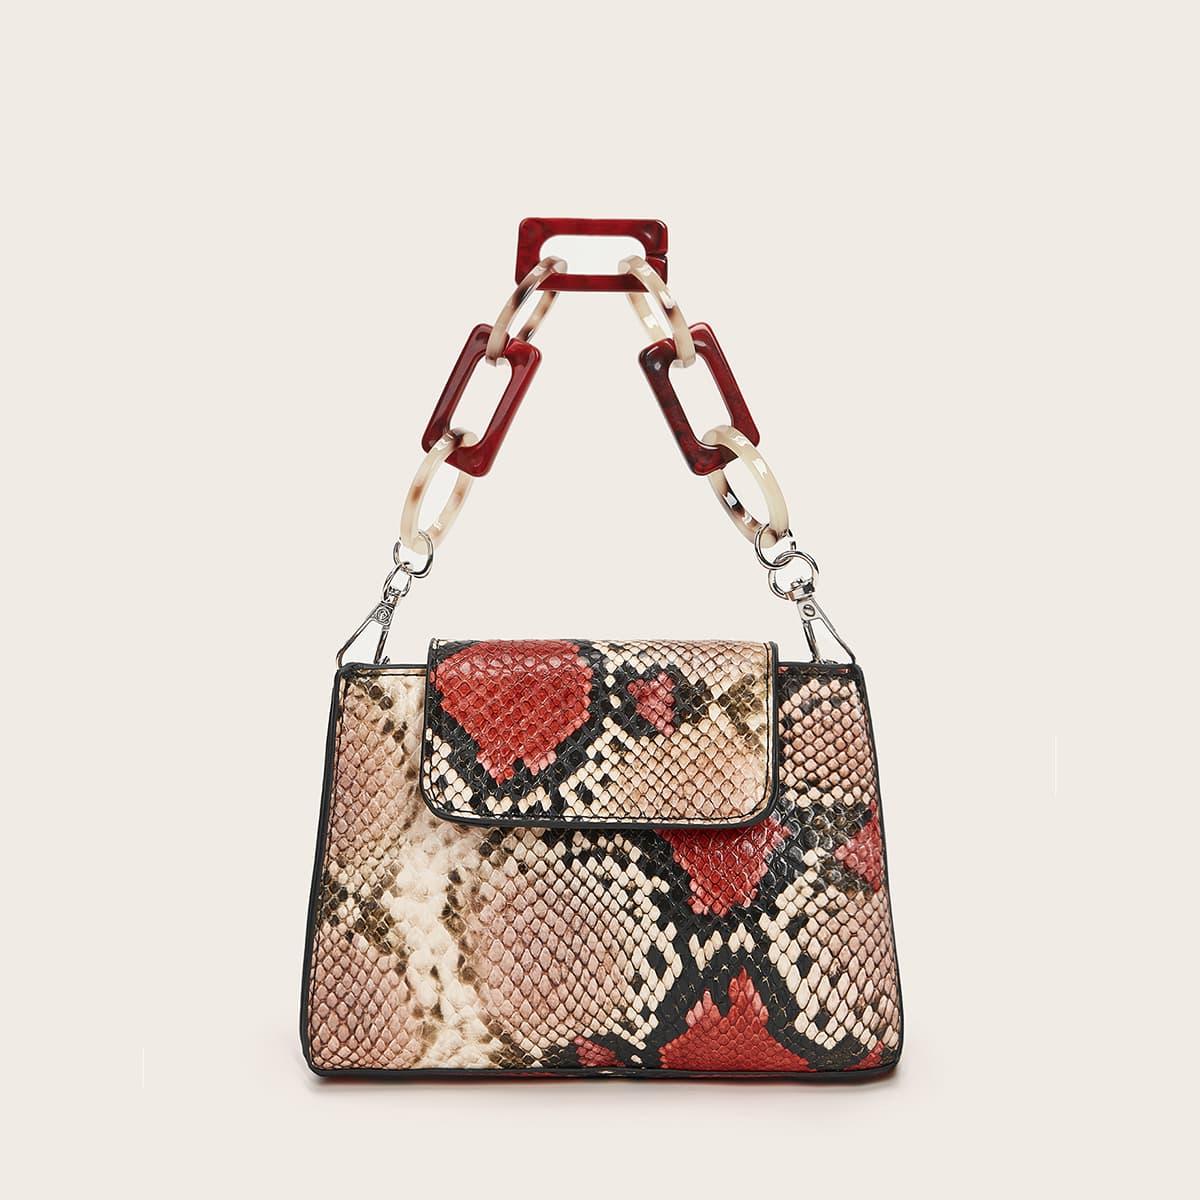 SHEIN / Snakeskin Print Chain Satchel Bag